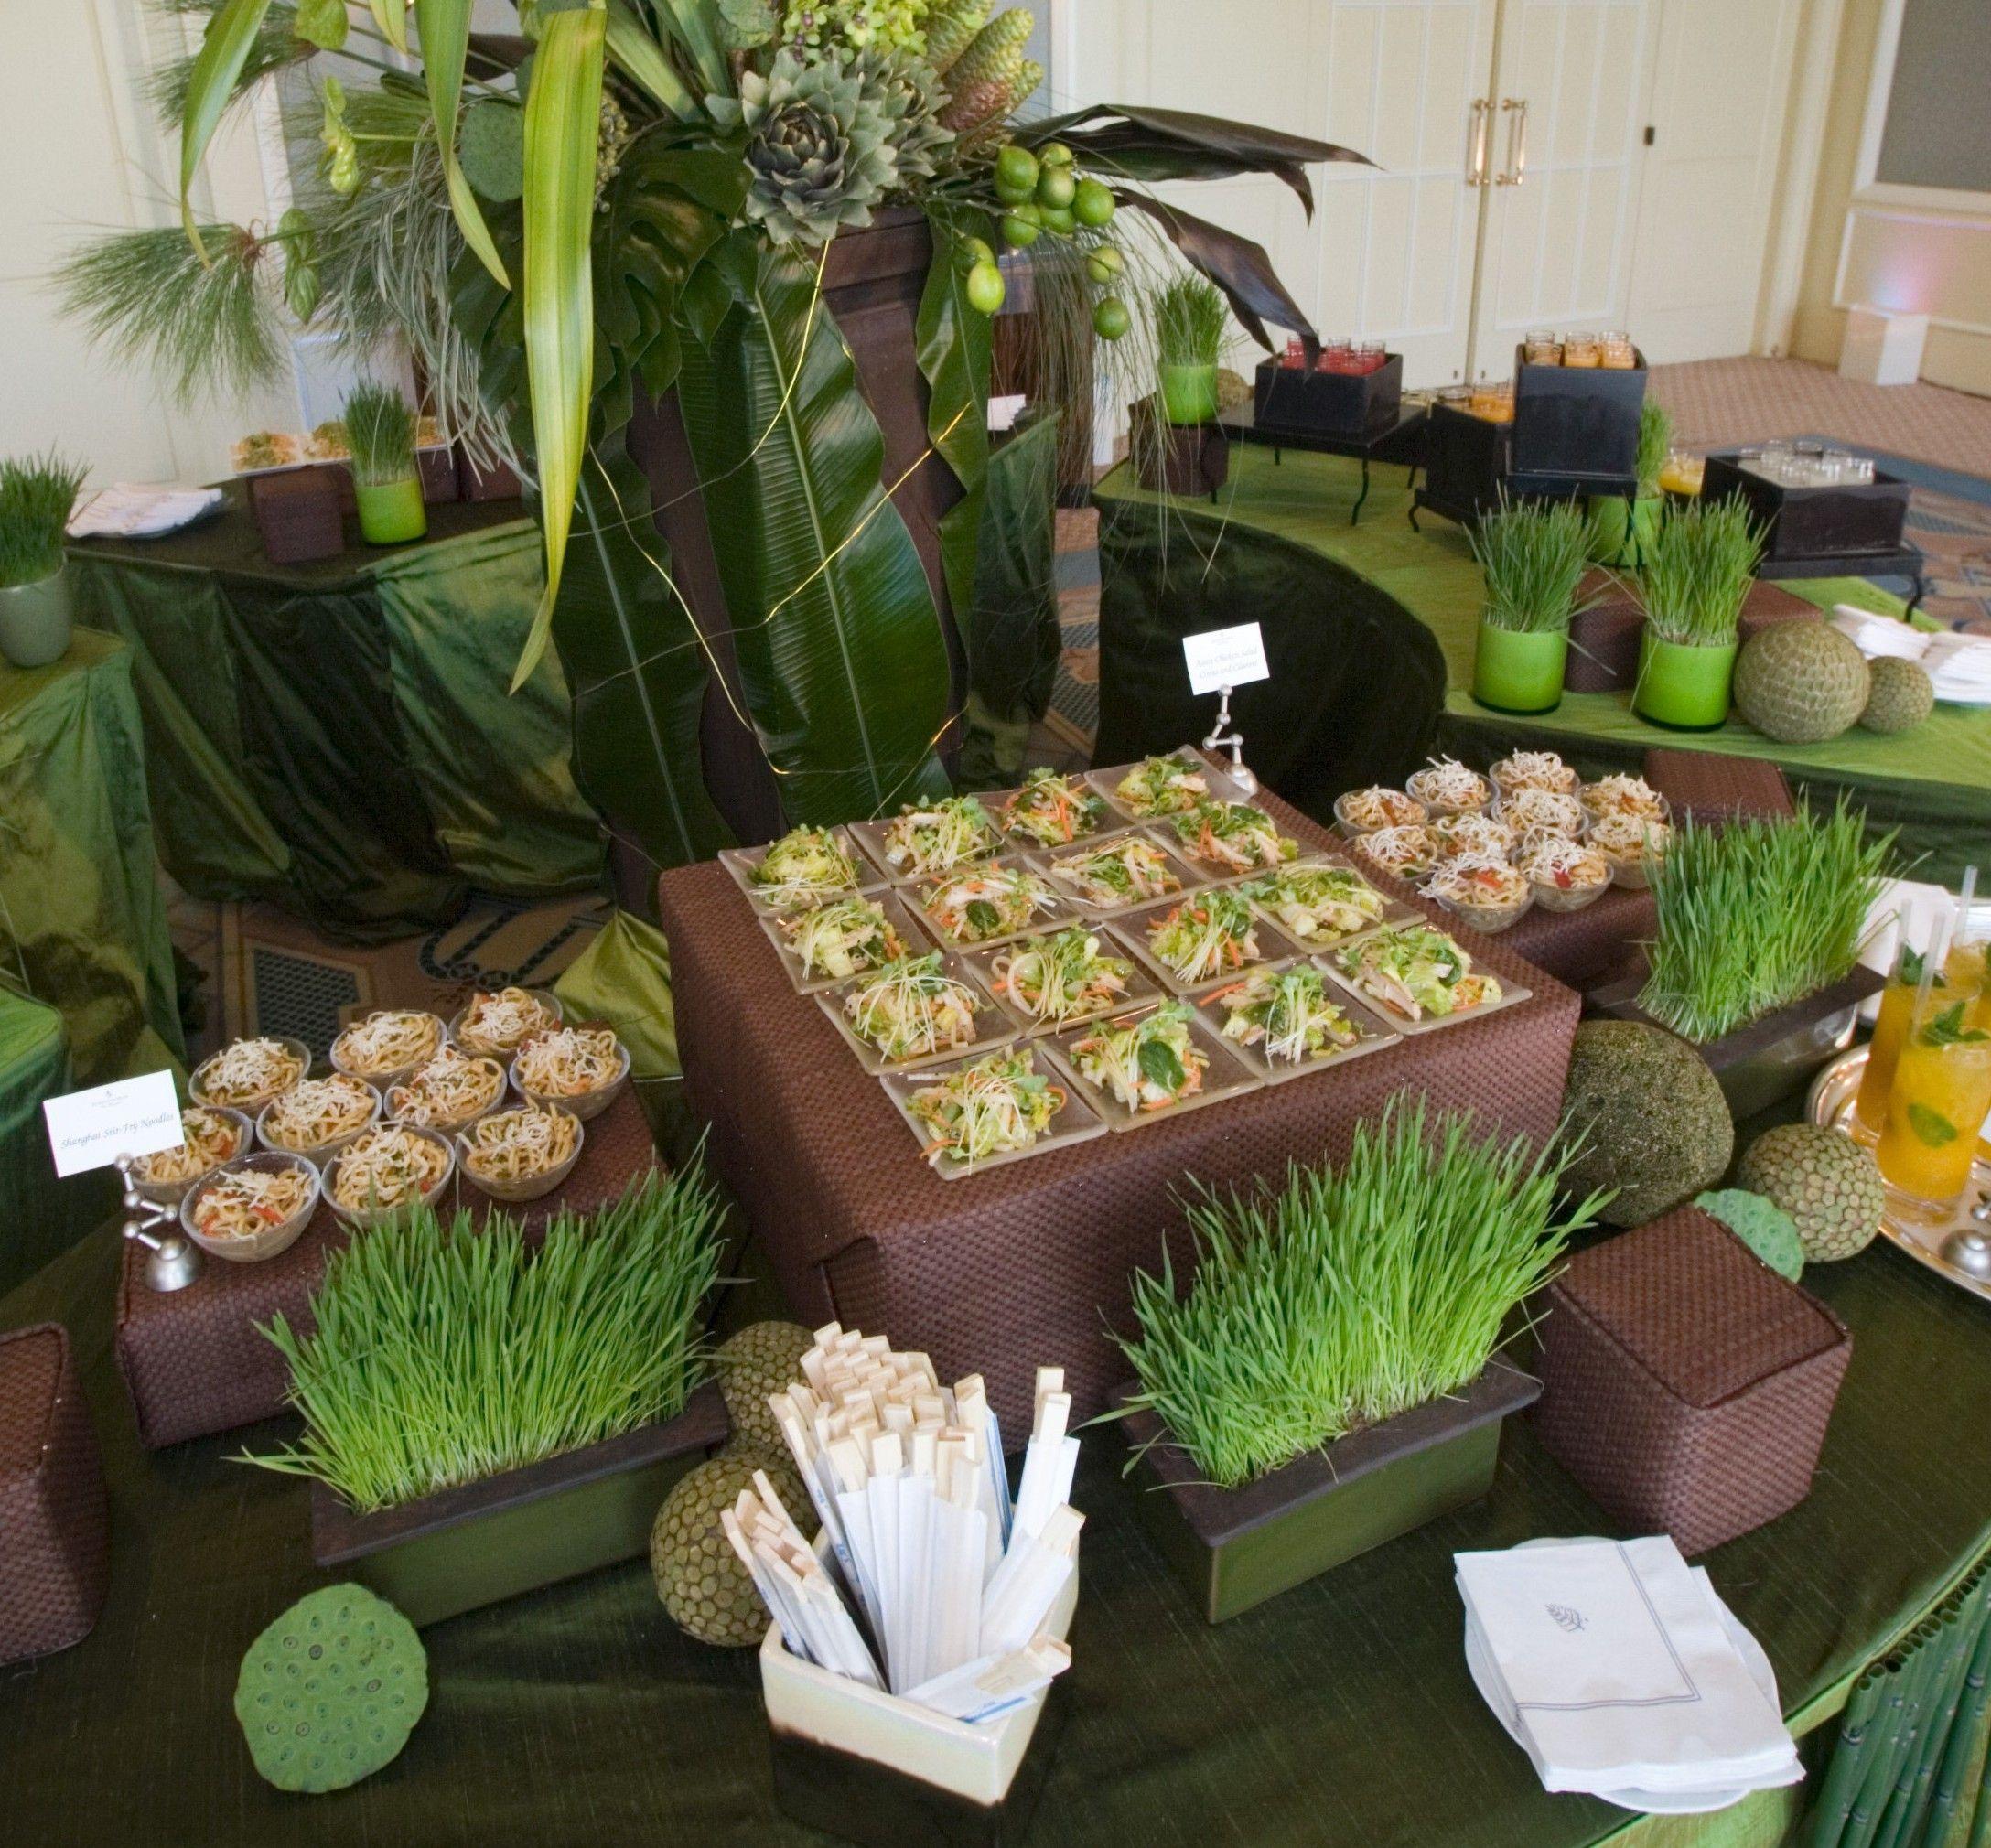 Wedding Reception Food Station Ideas: No Buffet Creative Interacitve Food Stations Small